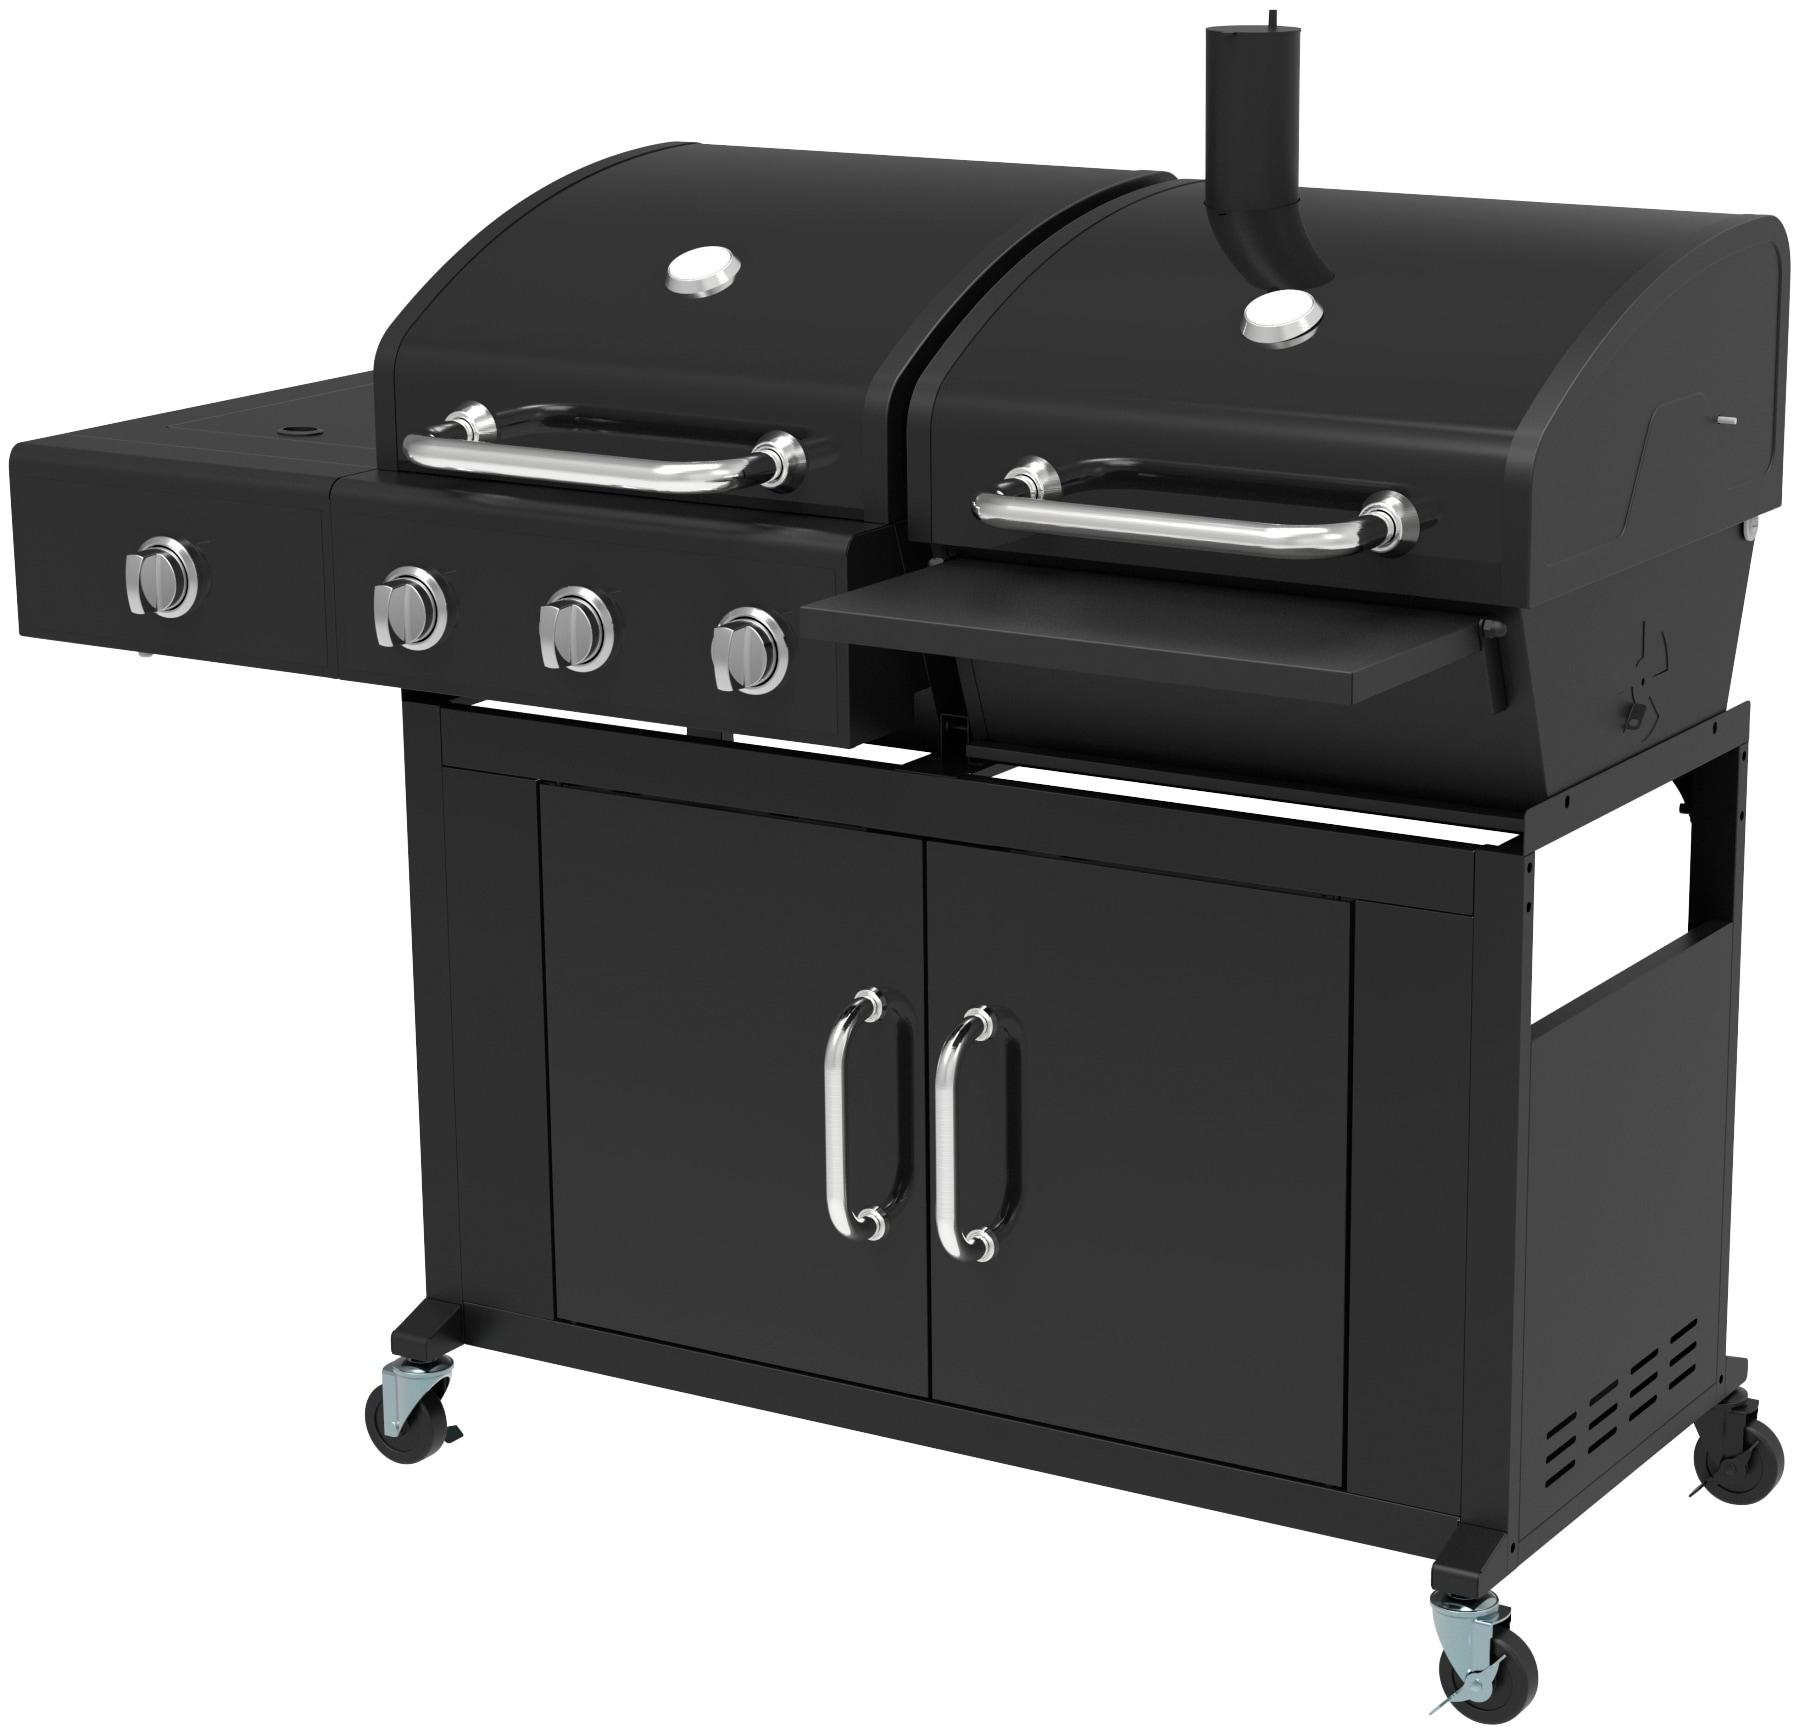 Rösle Gasgrill Angebote : ᐅᐅ】 gas grill rösle vergleichstest ✅ top